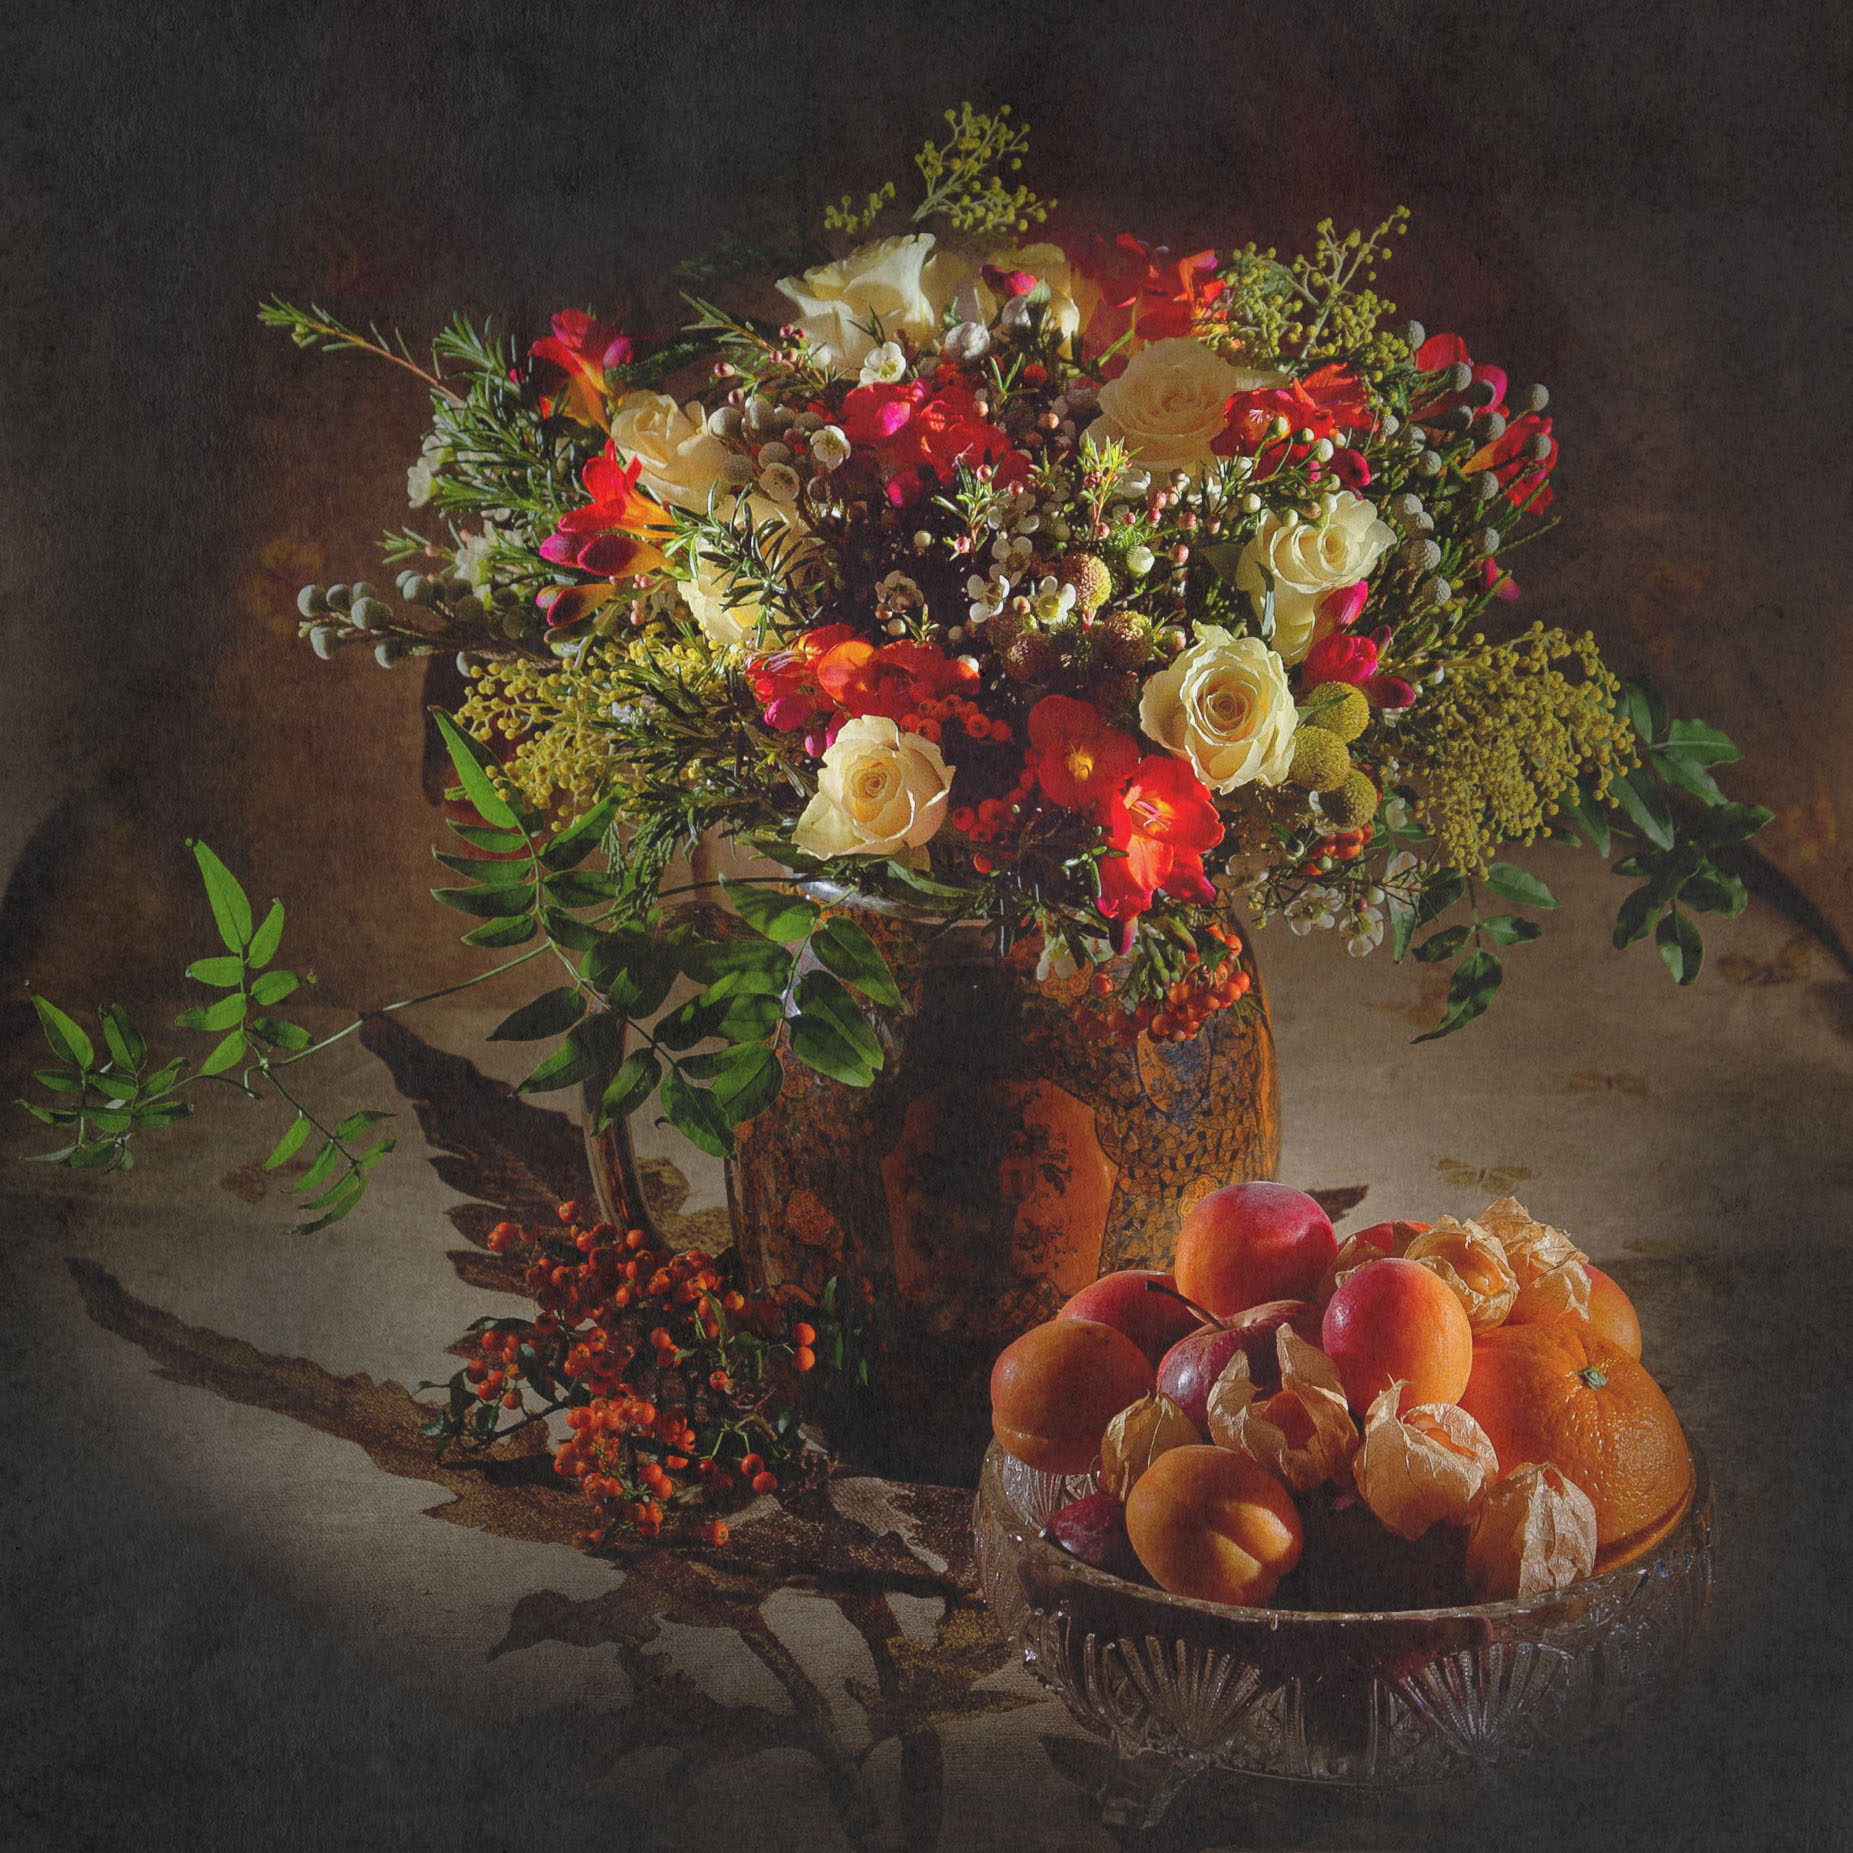 Rembrantflowers.jpg